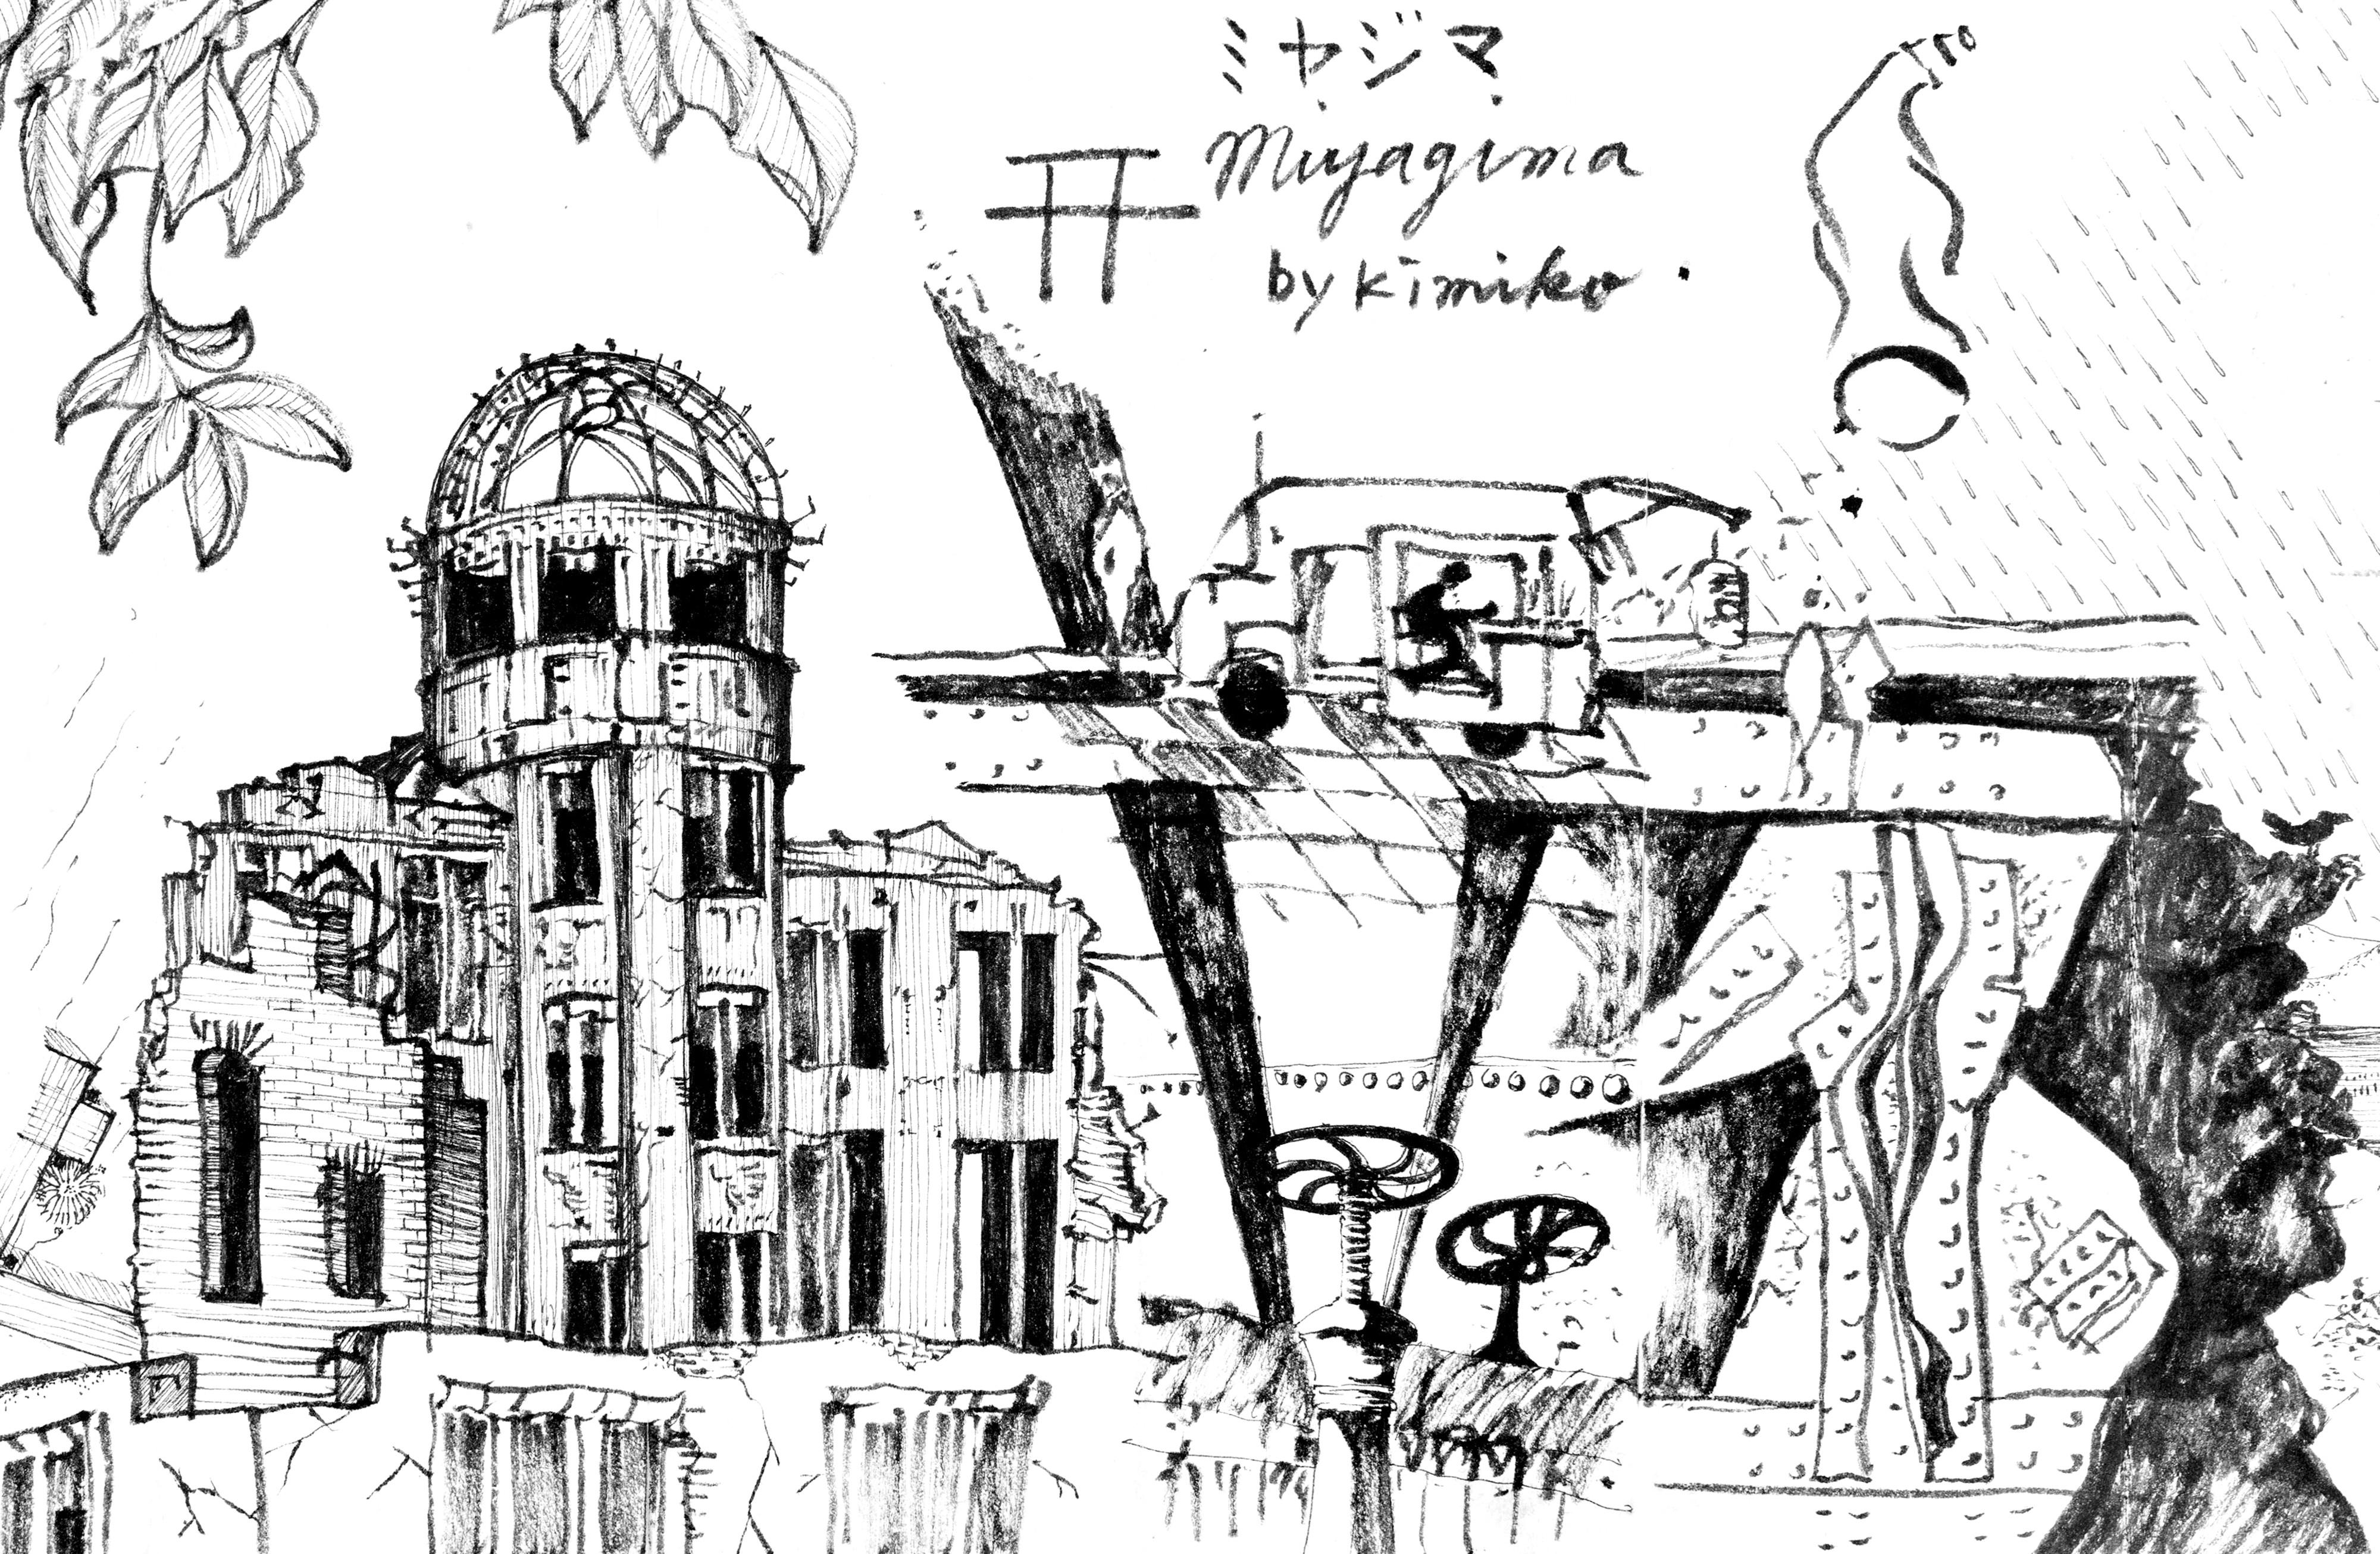 5.28 Hiroshima and Fukushima provide perspective on nuclear power